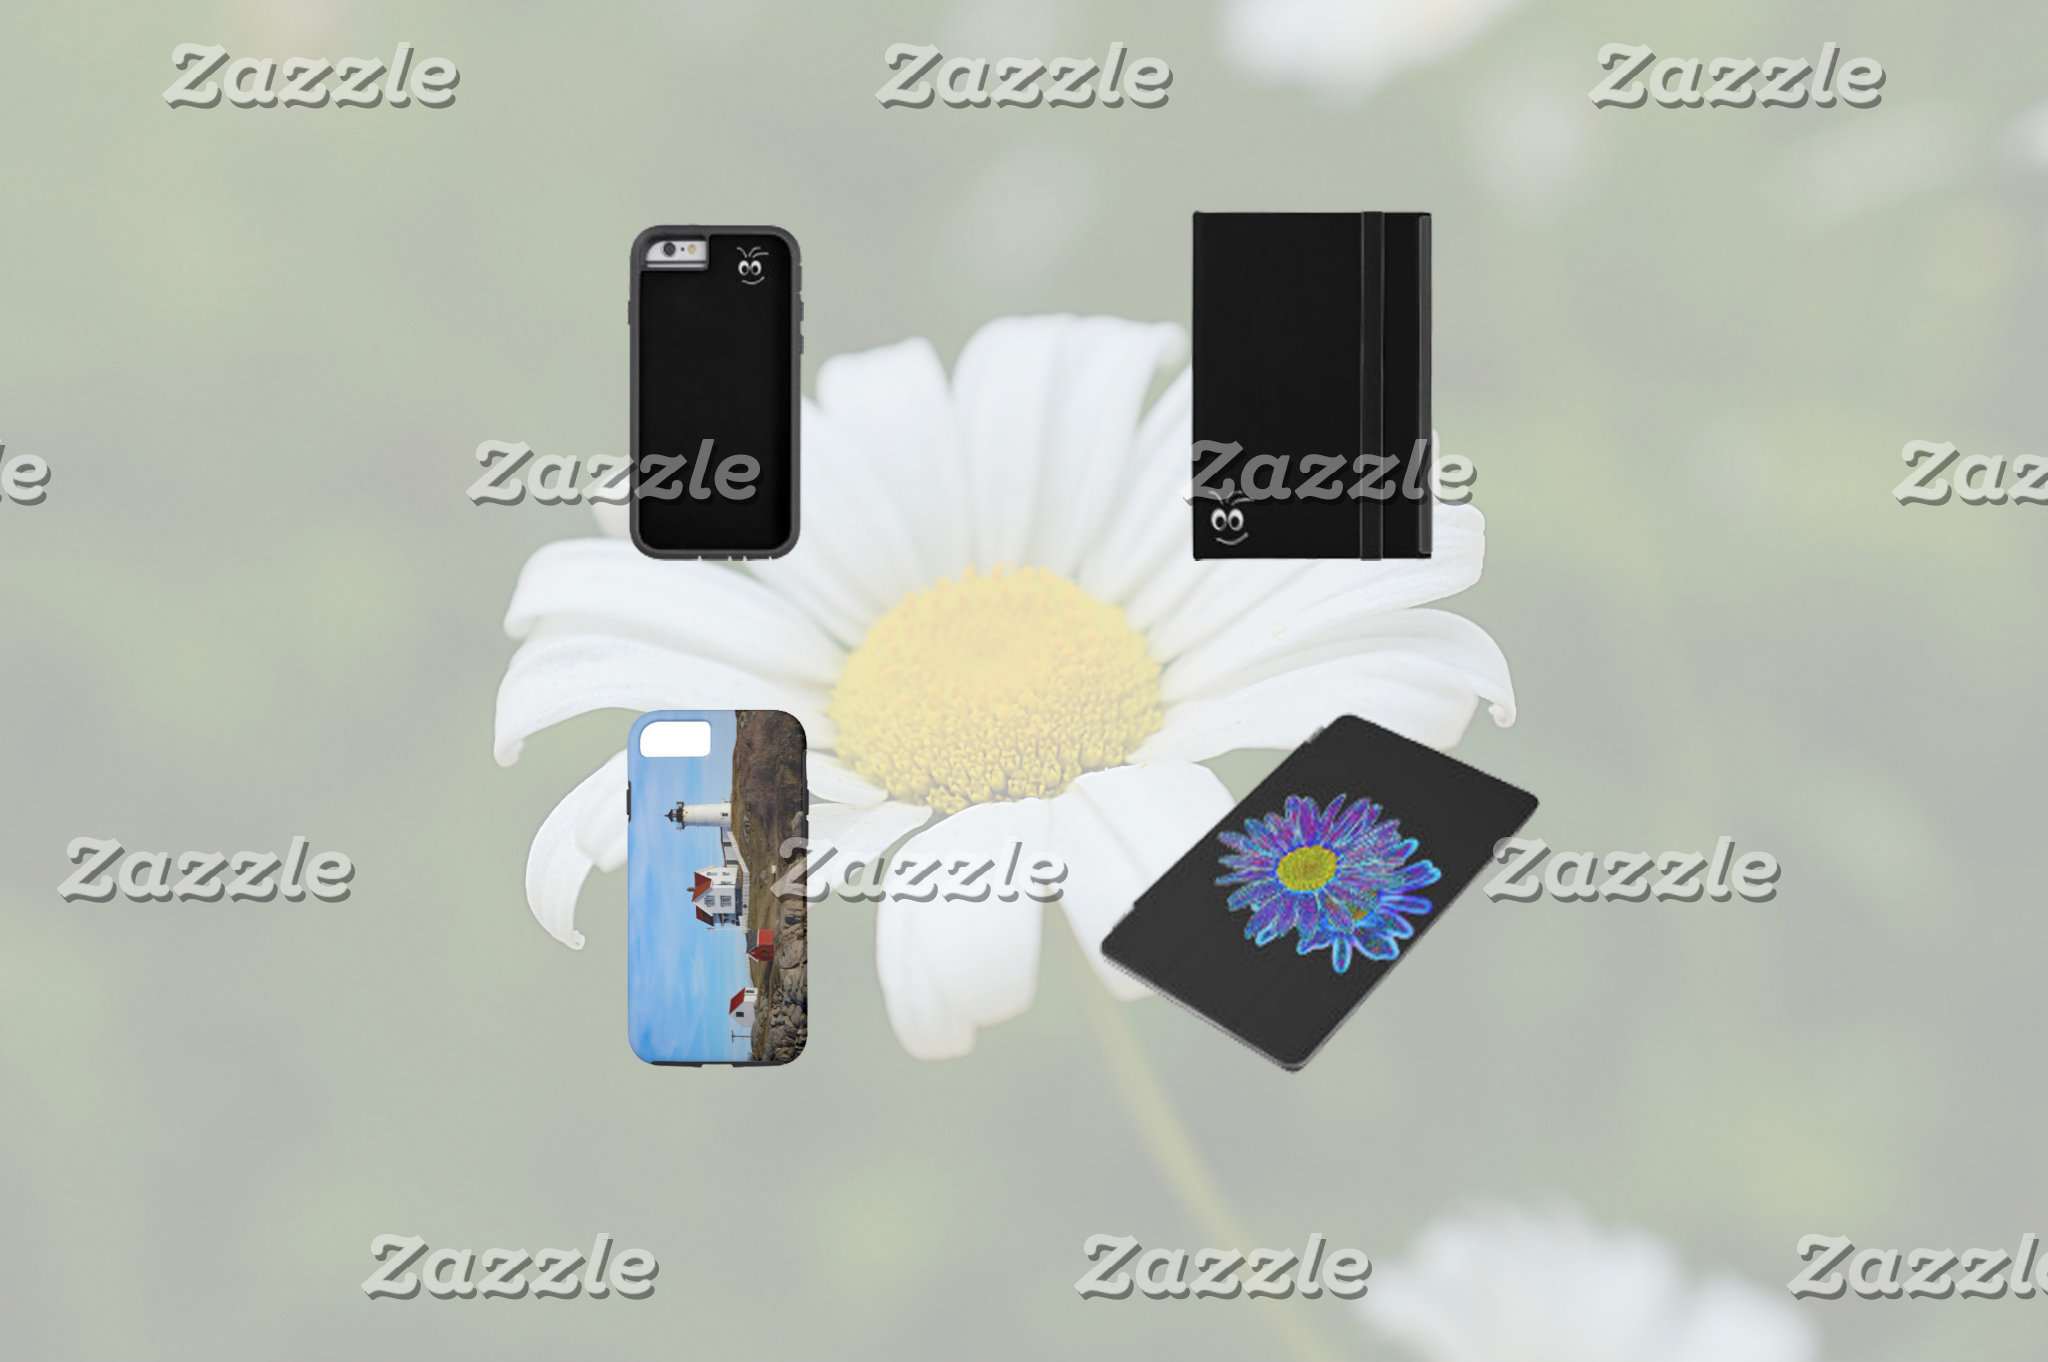 Iphone, mac, ipad, cell phone, etc. accessories